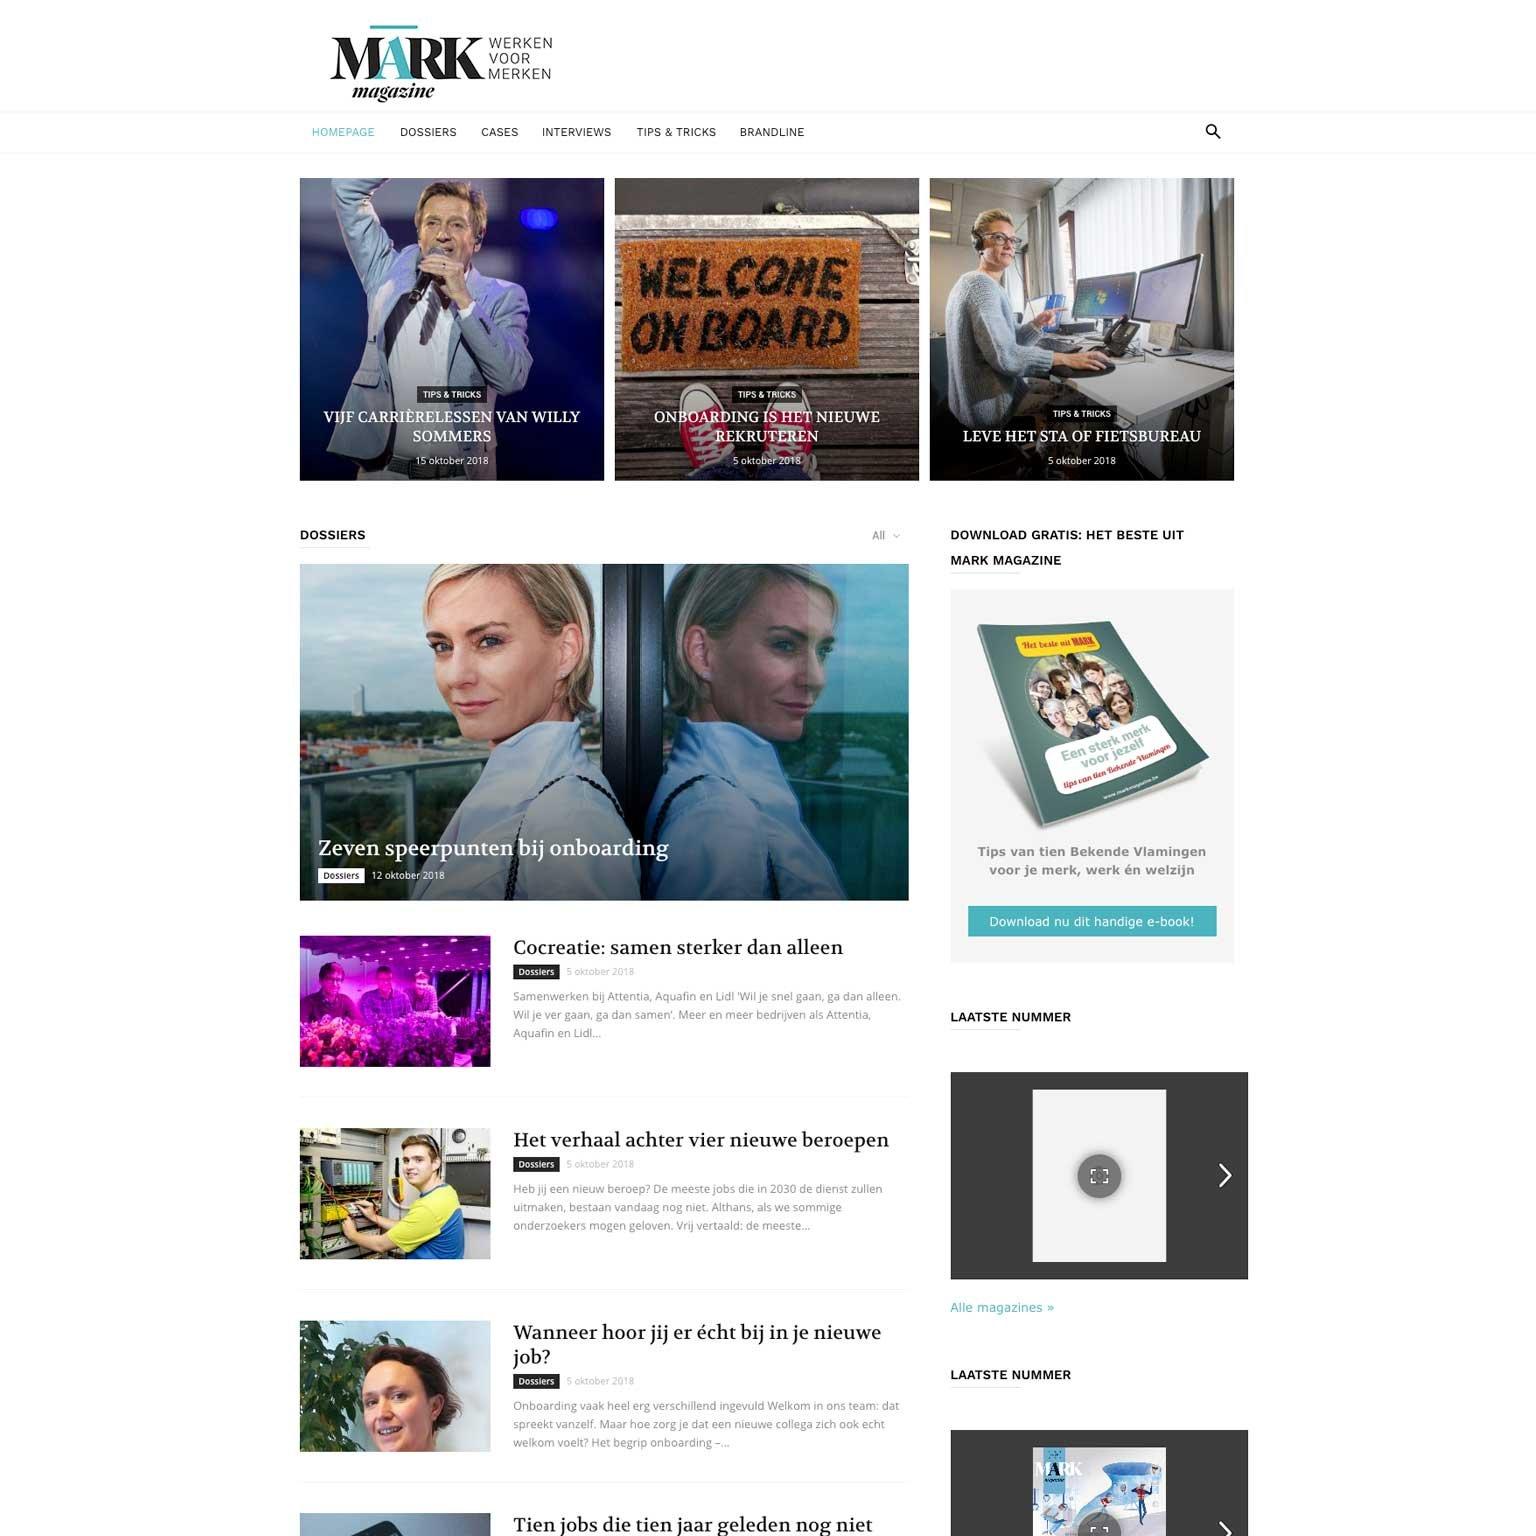 leadstreet-case-study-markmagazine-3